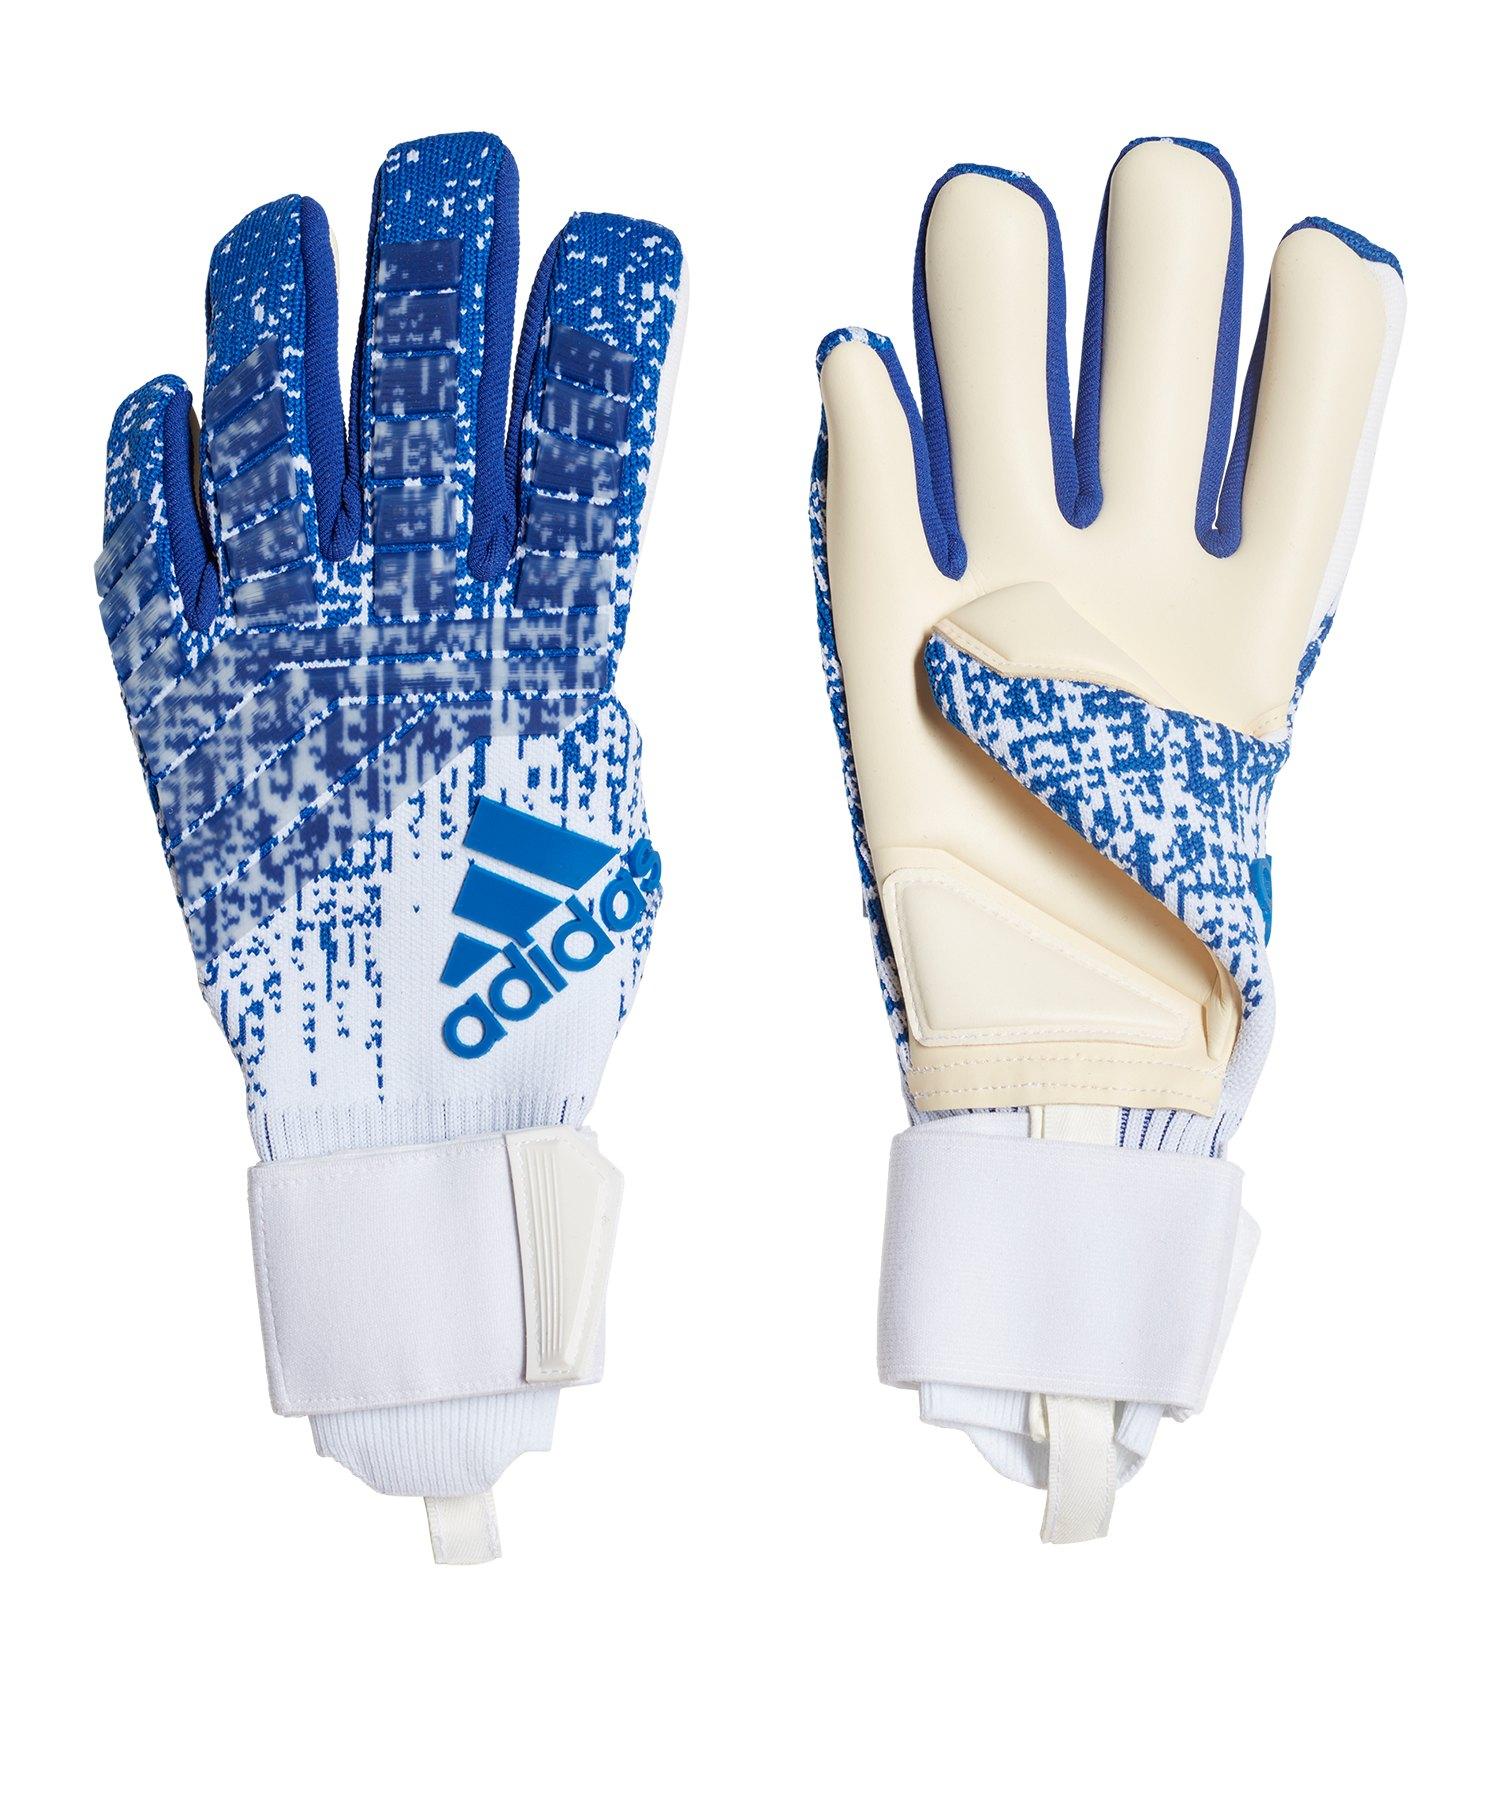 adidas Predator Pro Purecontrol TW Handschuh Blau